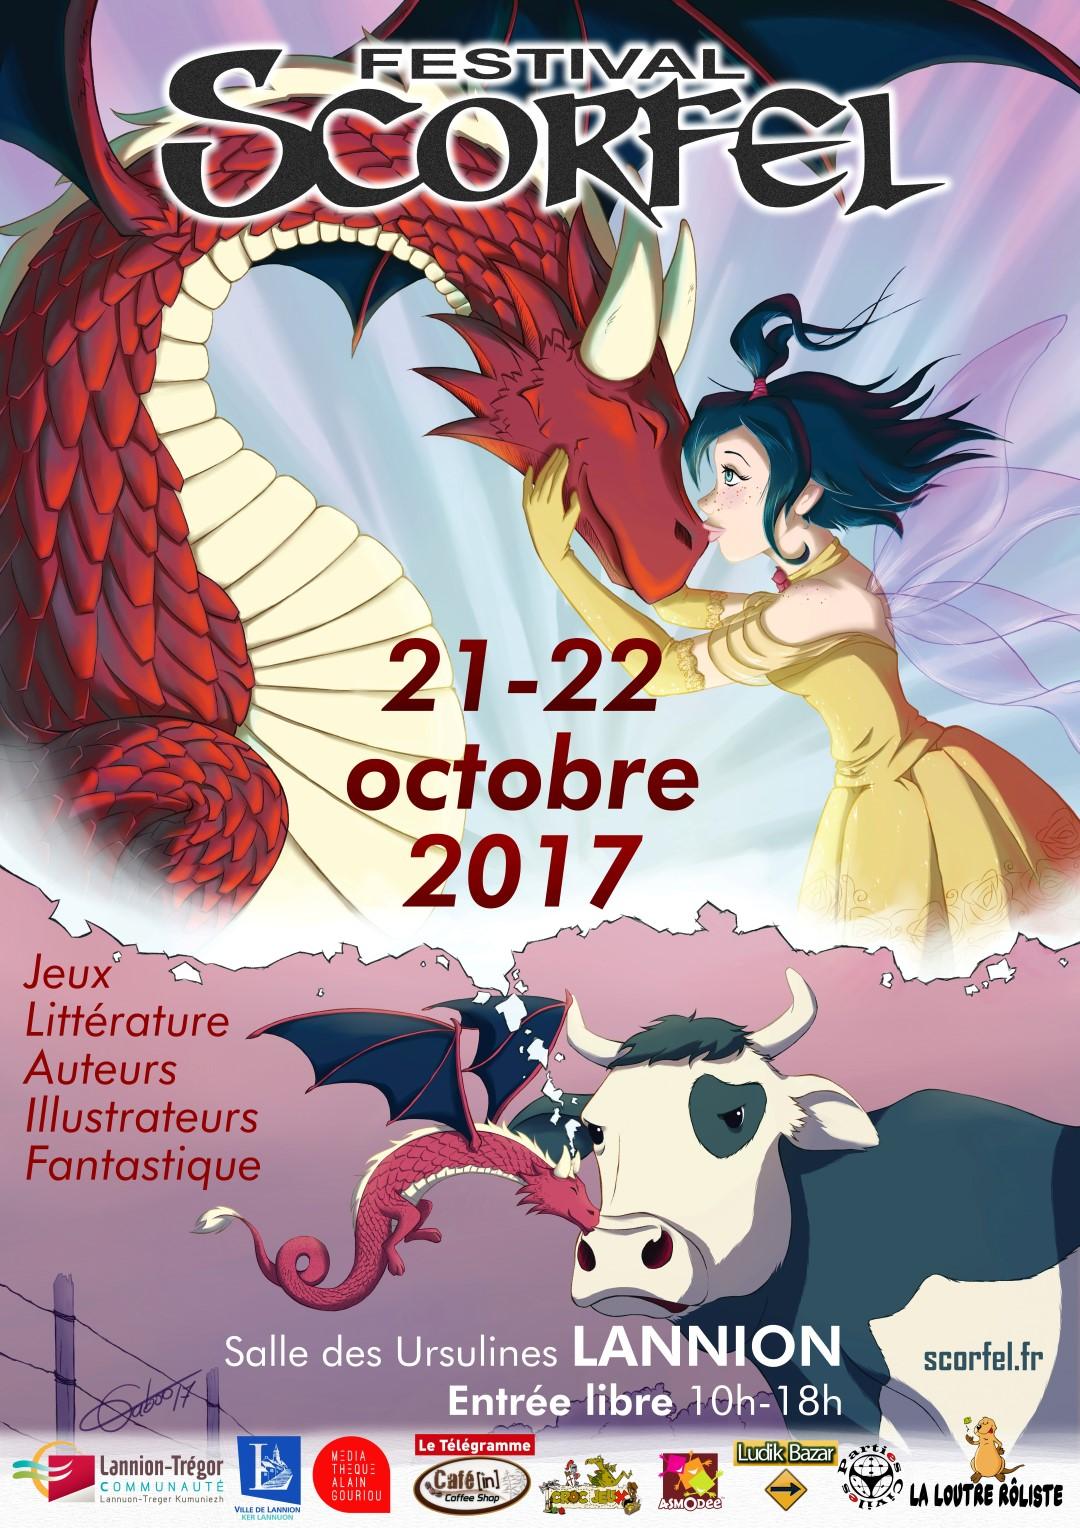 Festival Scorfel, Lannion 21-22 octobre 2017 Scorfel_2017_partage%2B%2528Large%2529